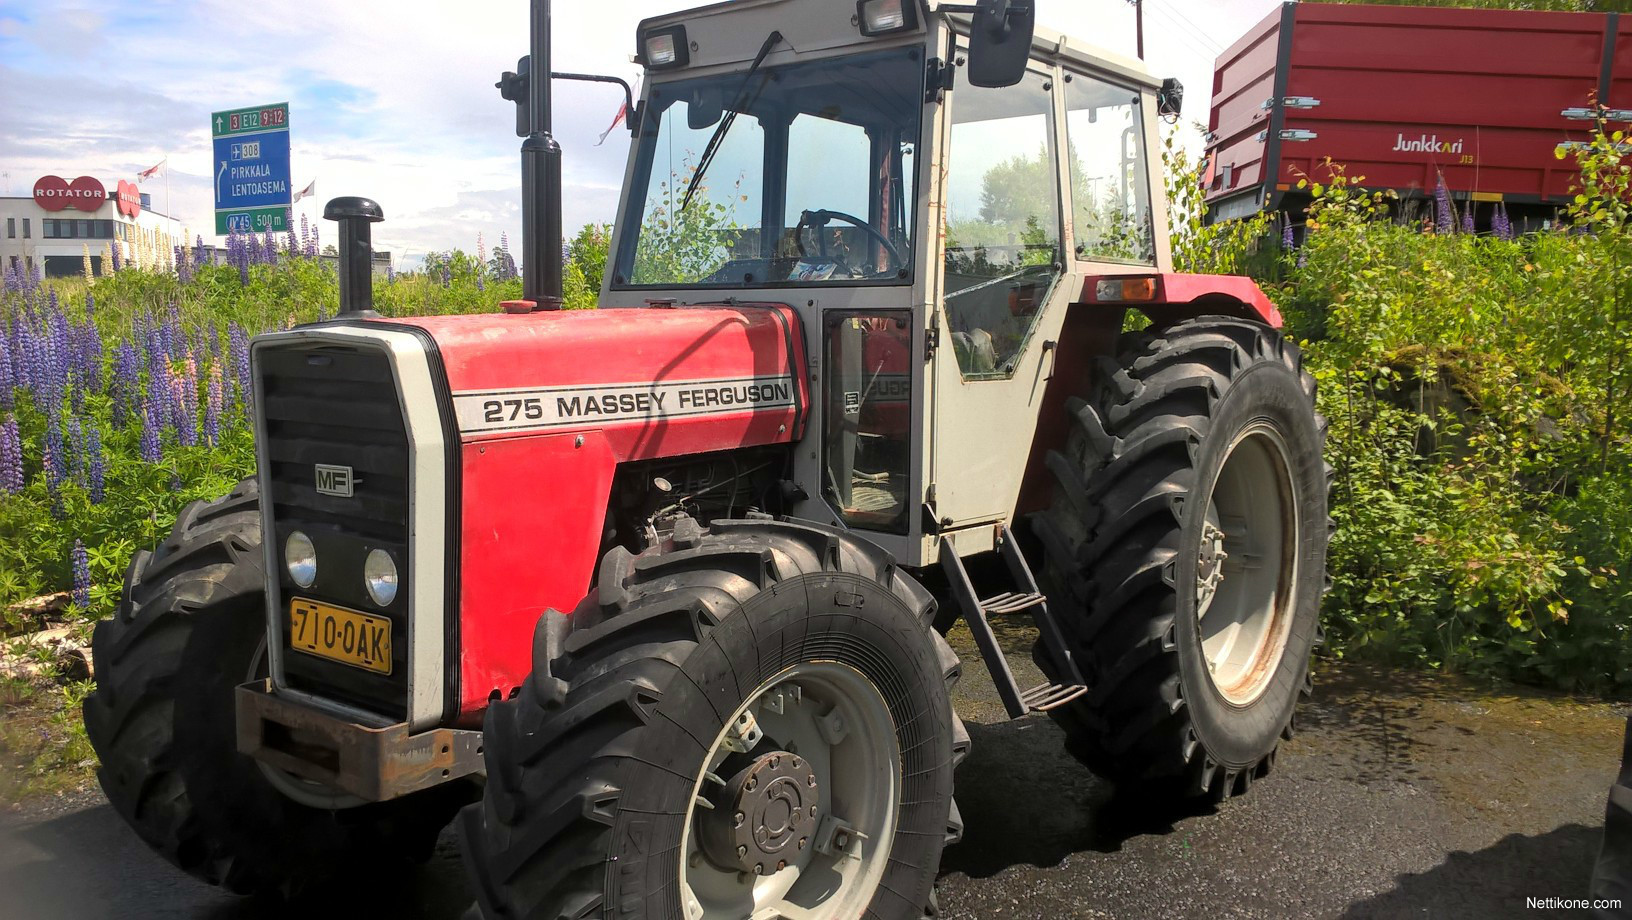 Mf 275 Tractor Data : Massey ferguson tractors nettikone